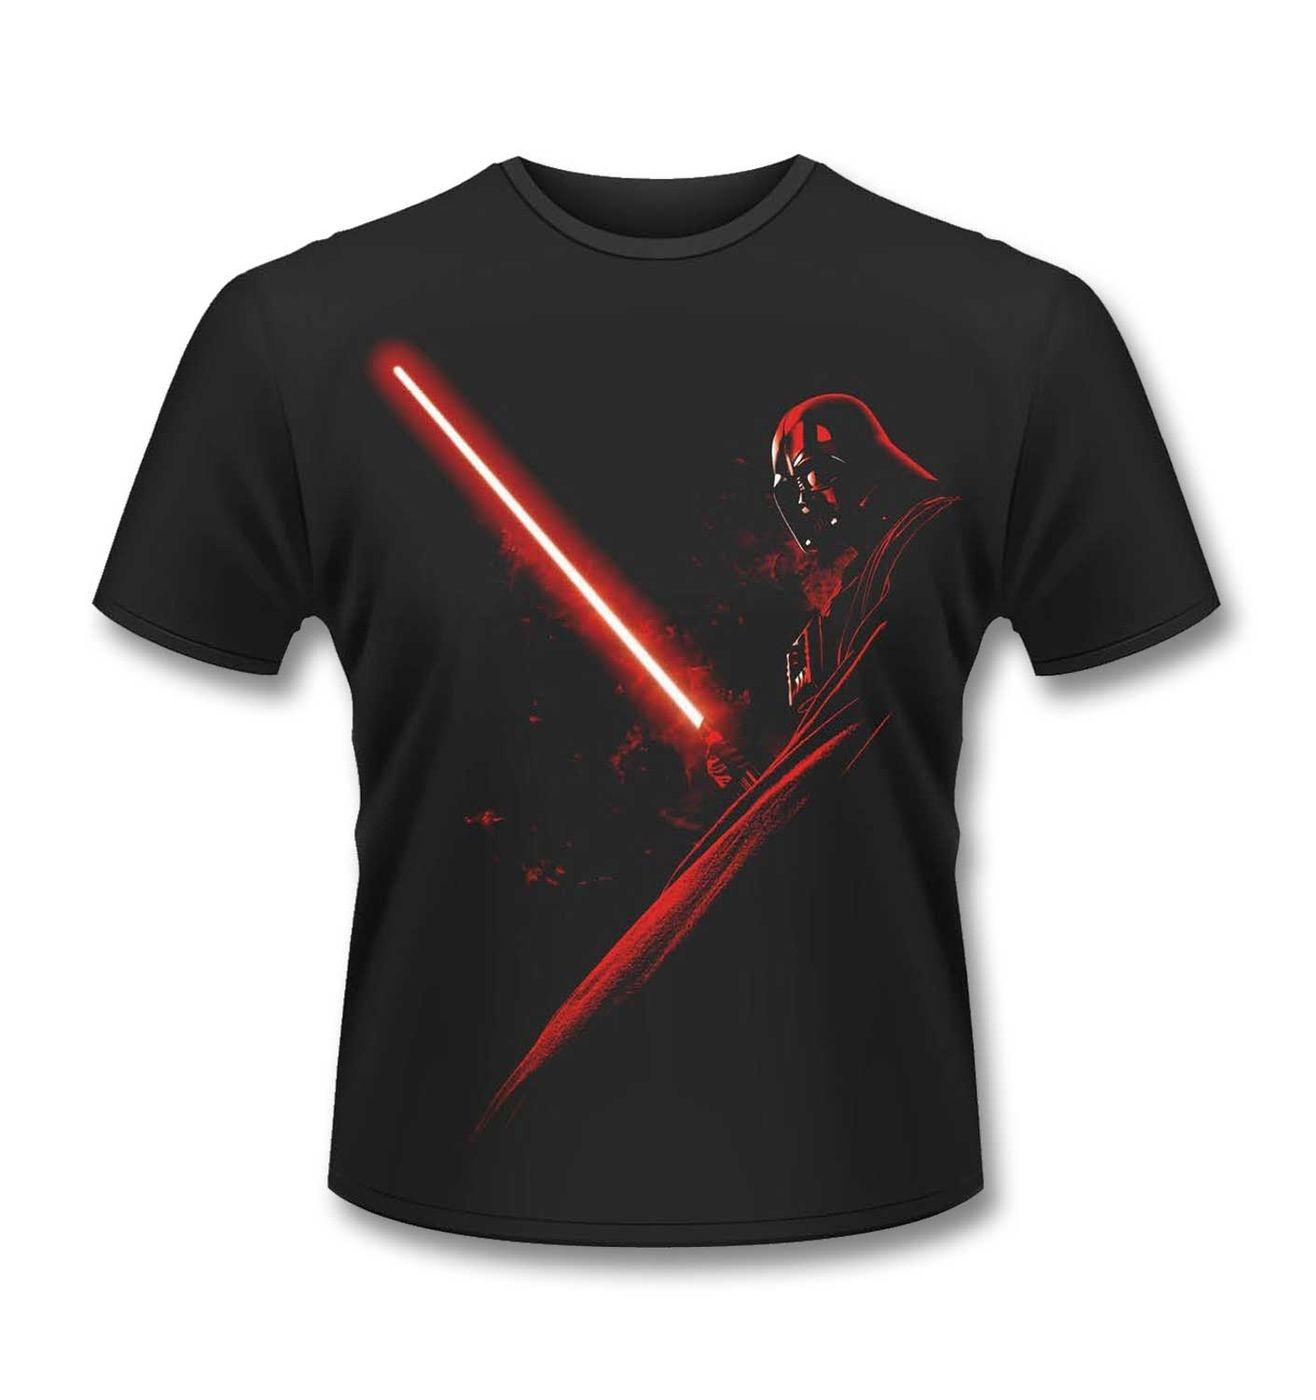 Darth Vader t-shirt - official Star Wars merchandise